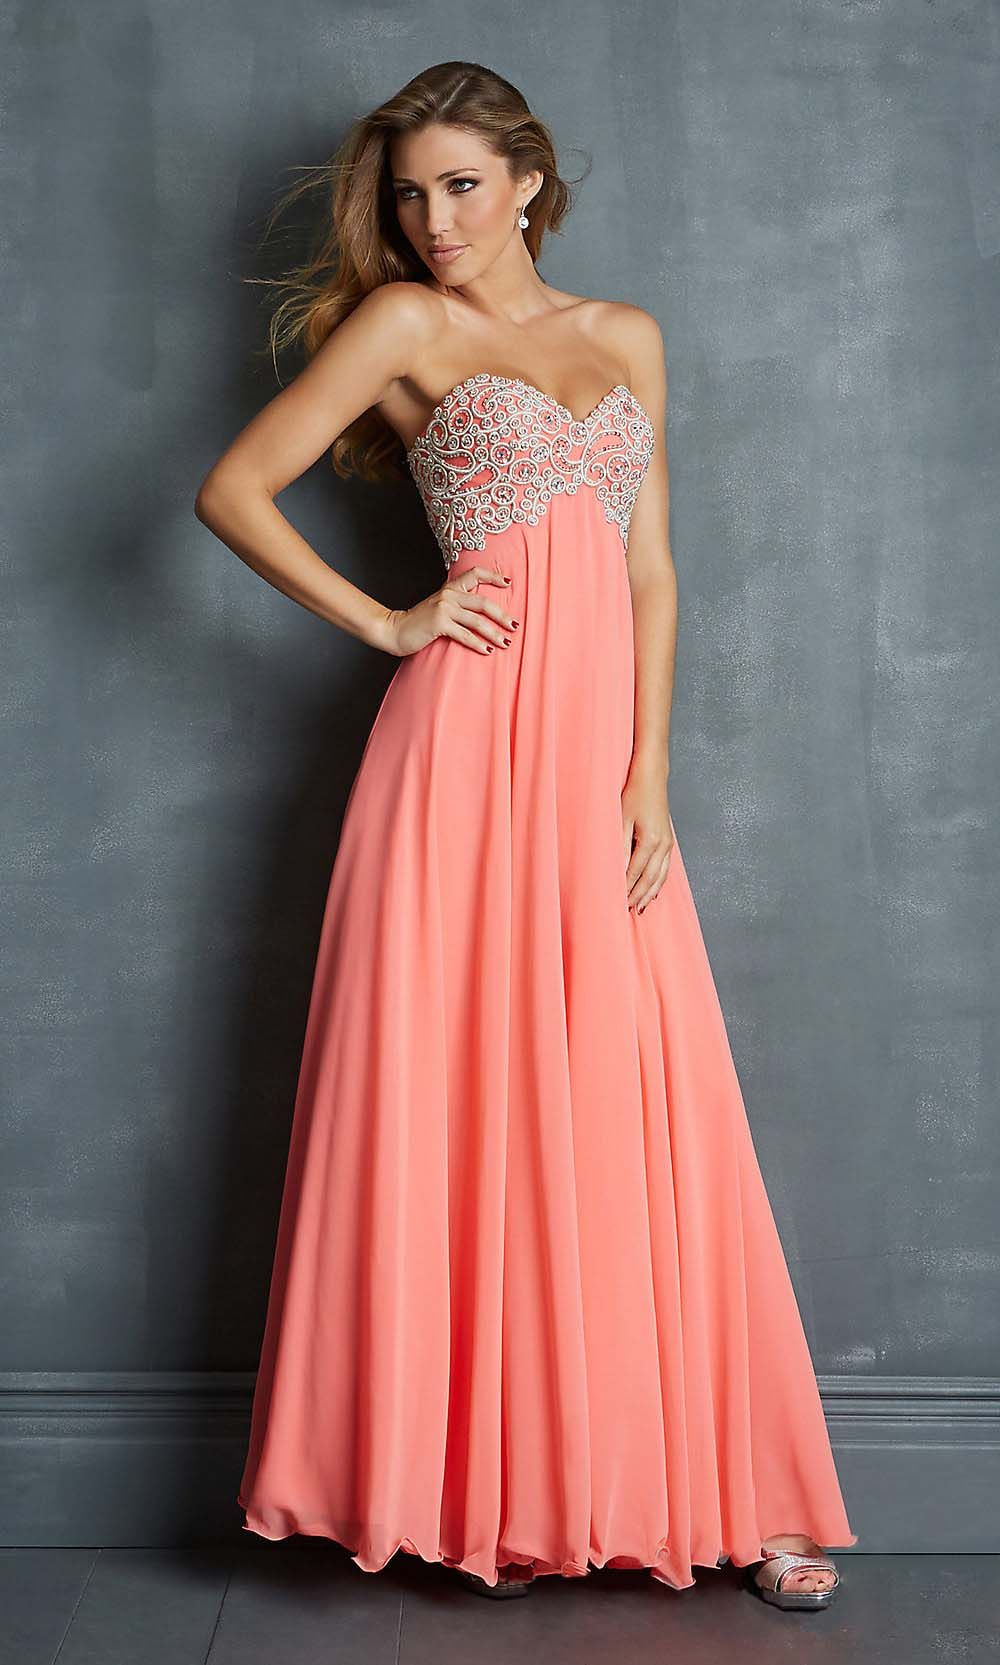 applique prom dresses, coral prom dress, long prom dresses